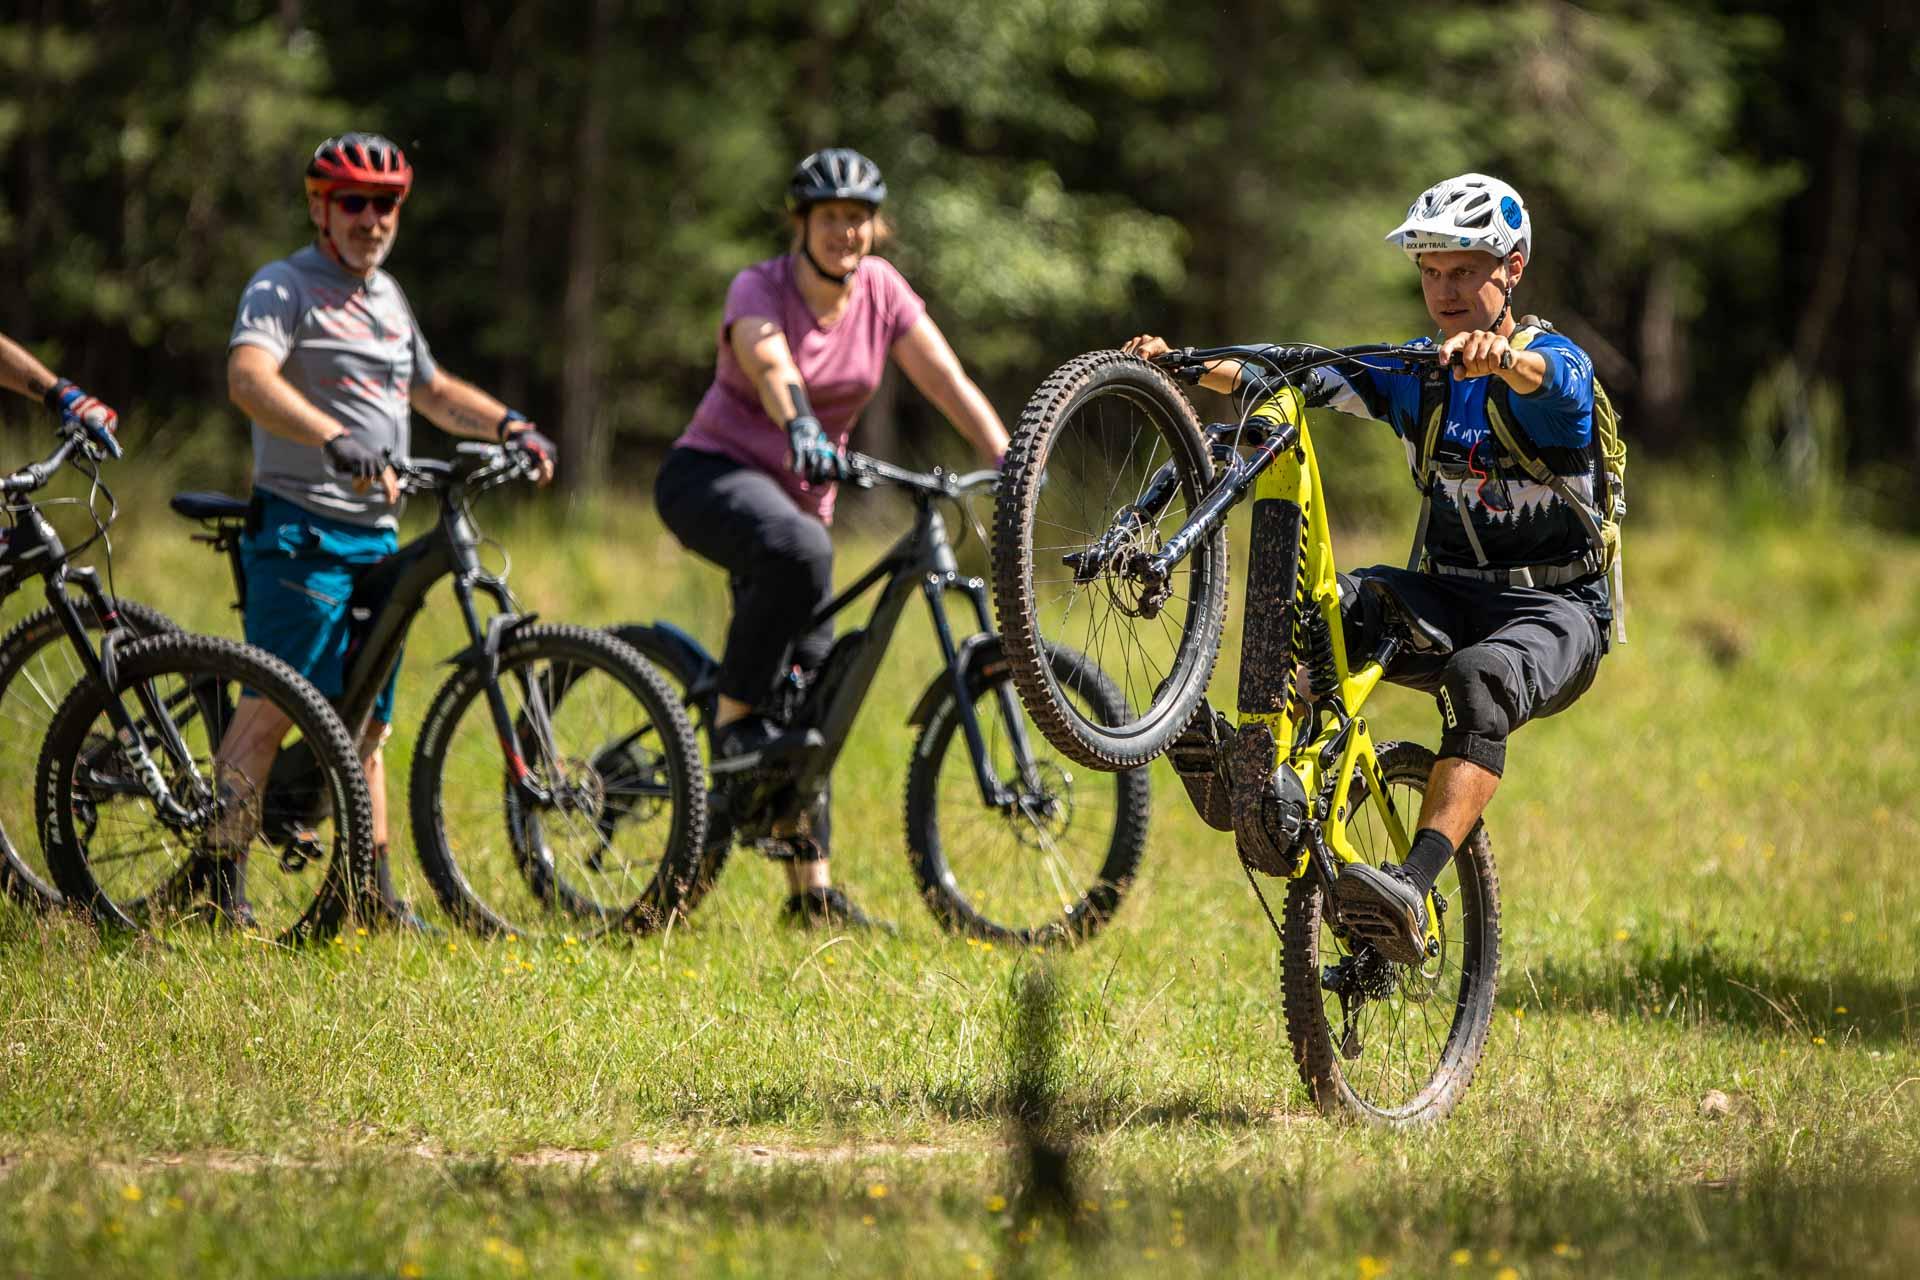 eMTB eBike Fortgeschritten Fahrtechnik Kurs in Siegen - Rock my Trail Bikeschule32